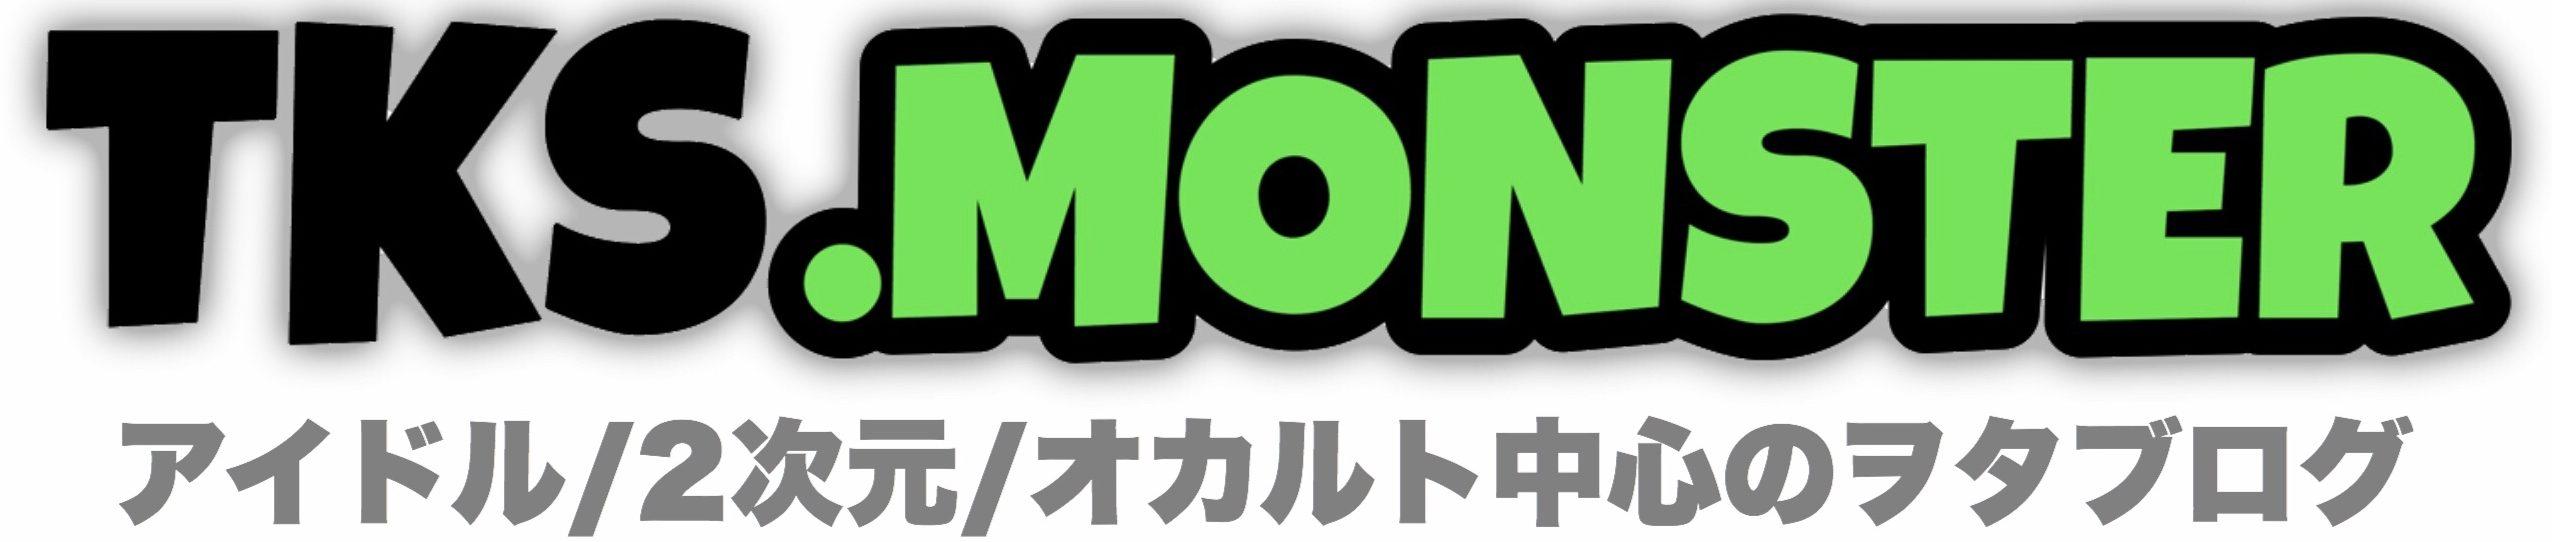 TKS.MONSTER -アイドル/2次元/ホラーブログ-